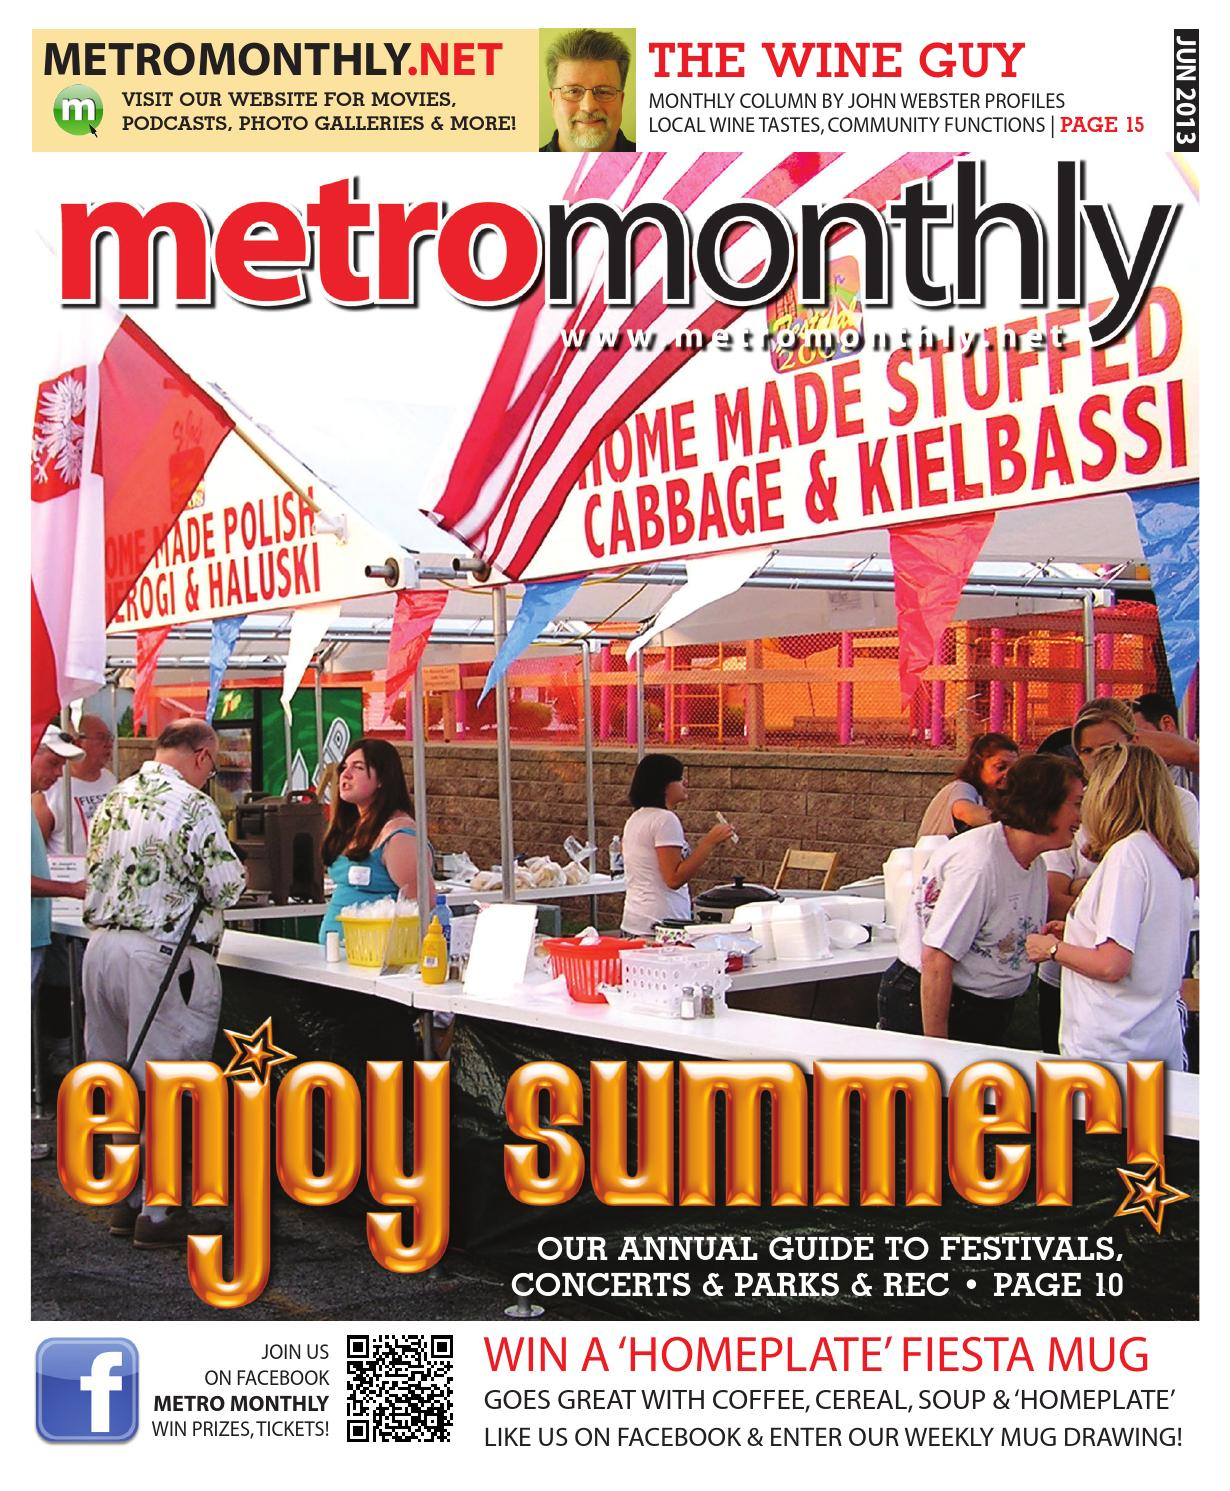 Metro Monthly JUN 2013 by Metro Monthly - issuu